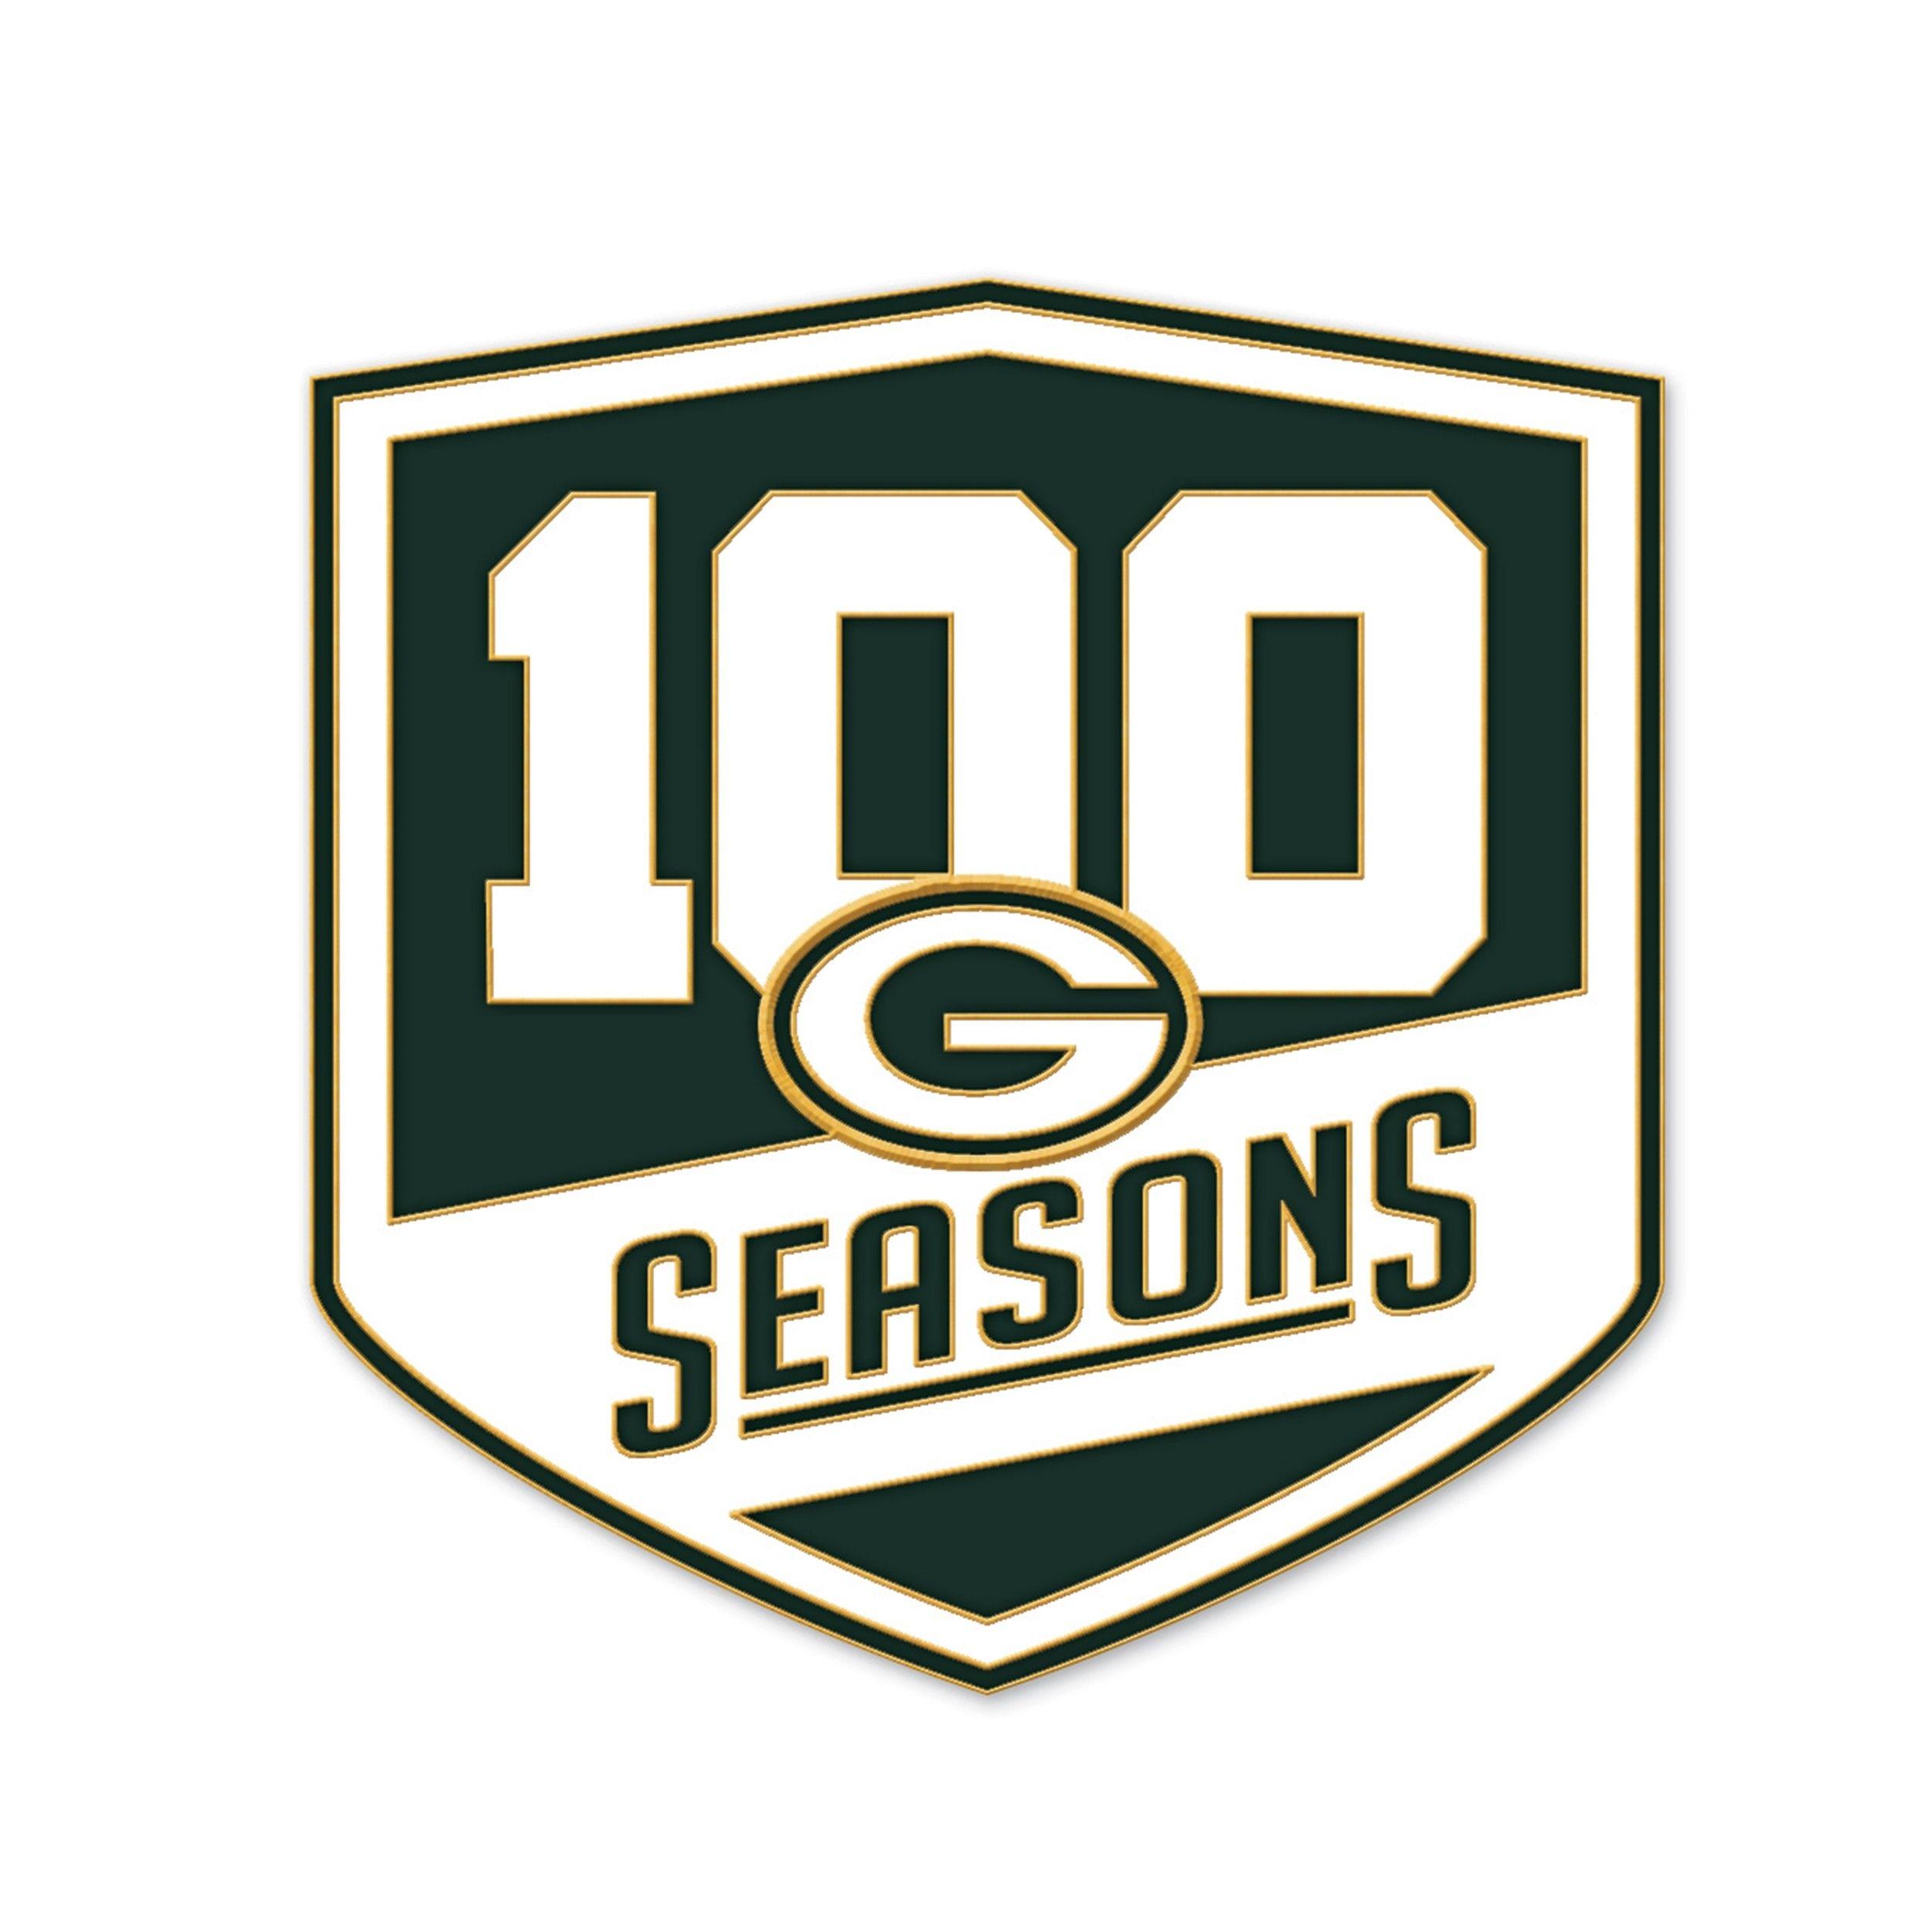 Packers 100 Seasons Logo Pin Green Bay Packers Green Bay Packers Gifts Green Bay Packers Football